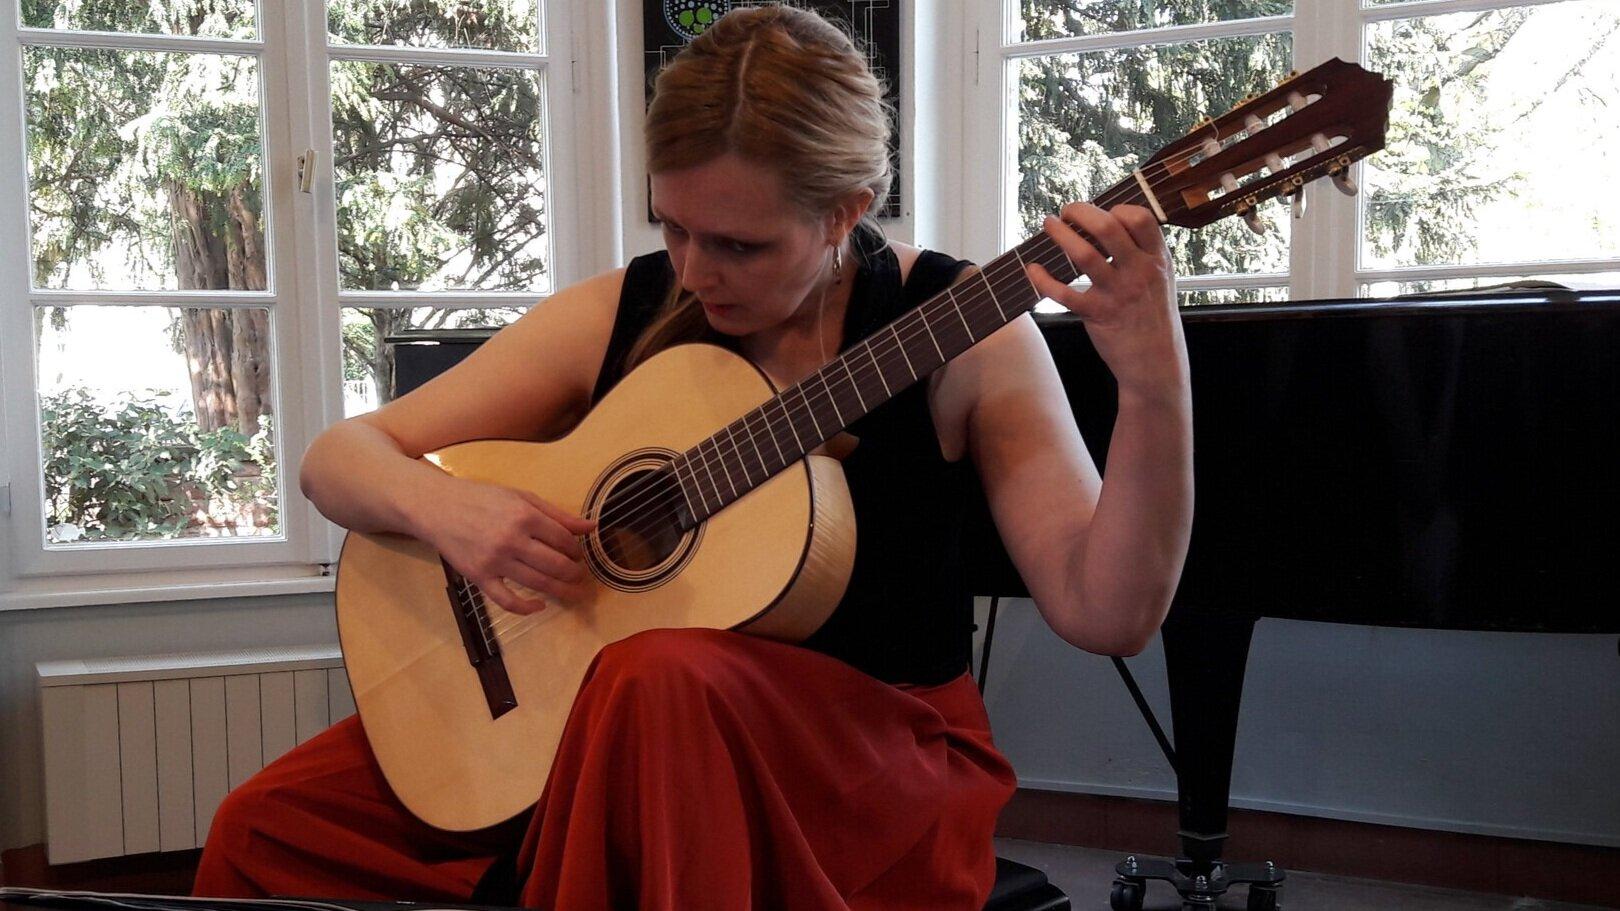 Heike Matthiesen playing part of her concert on Den Toom Luthier guitar in Maple. Frankfurt, Germany